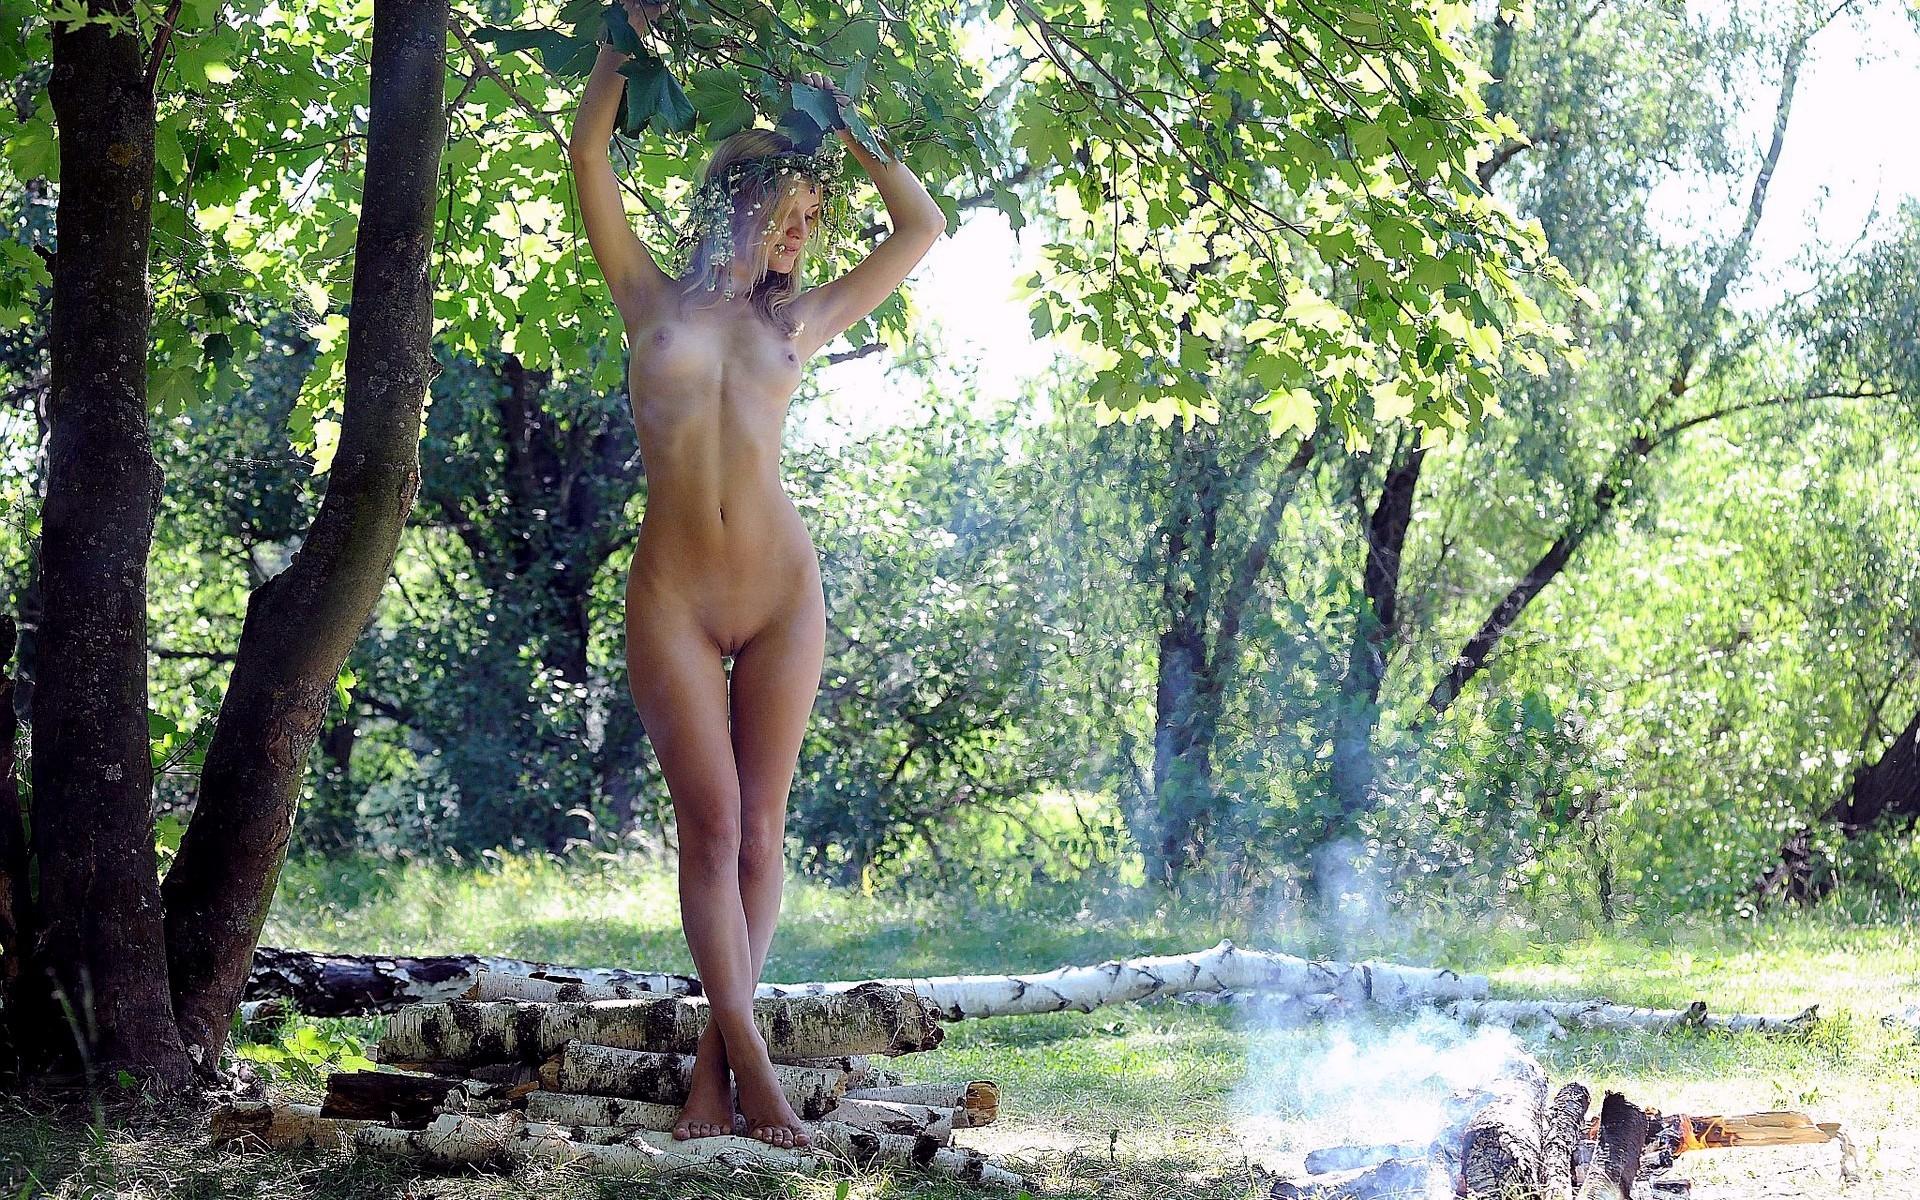 dama-dushe-na-prirode-video-erotika-chlenov-zhenskih